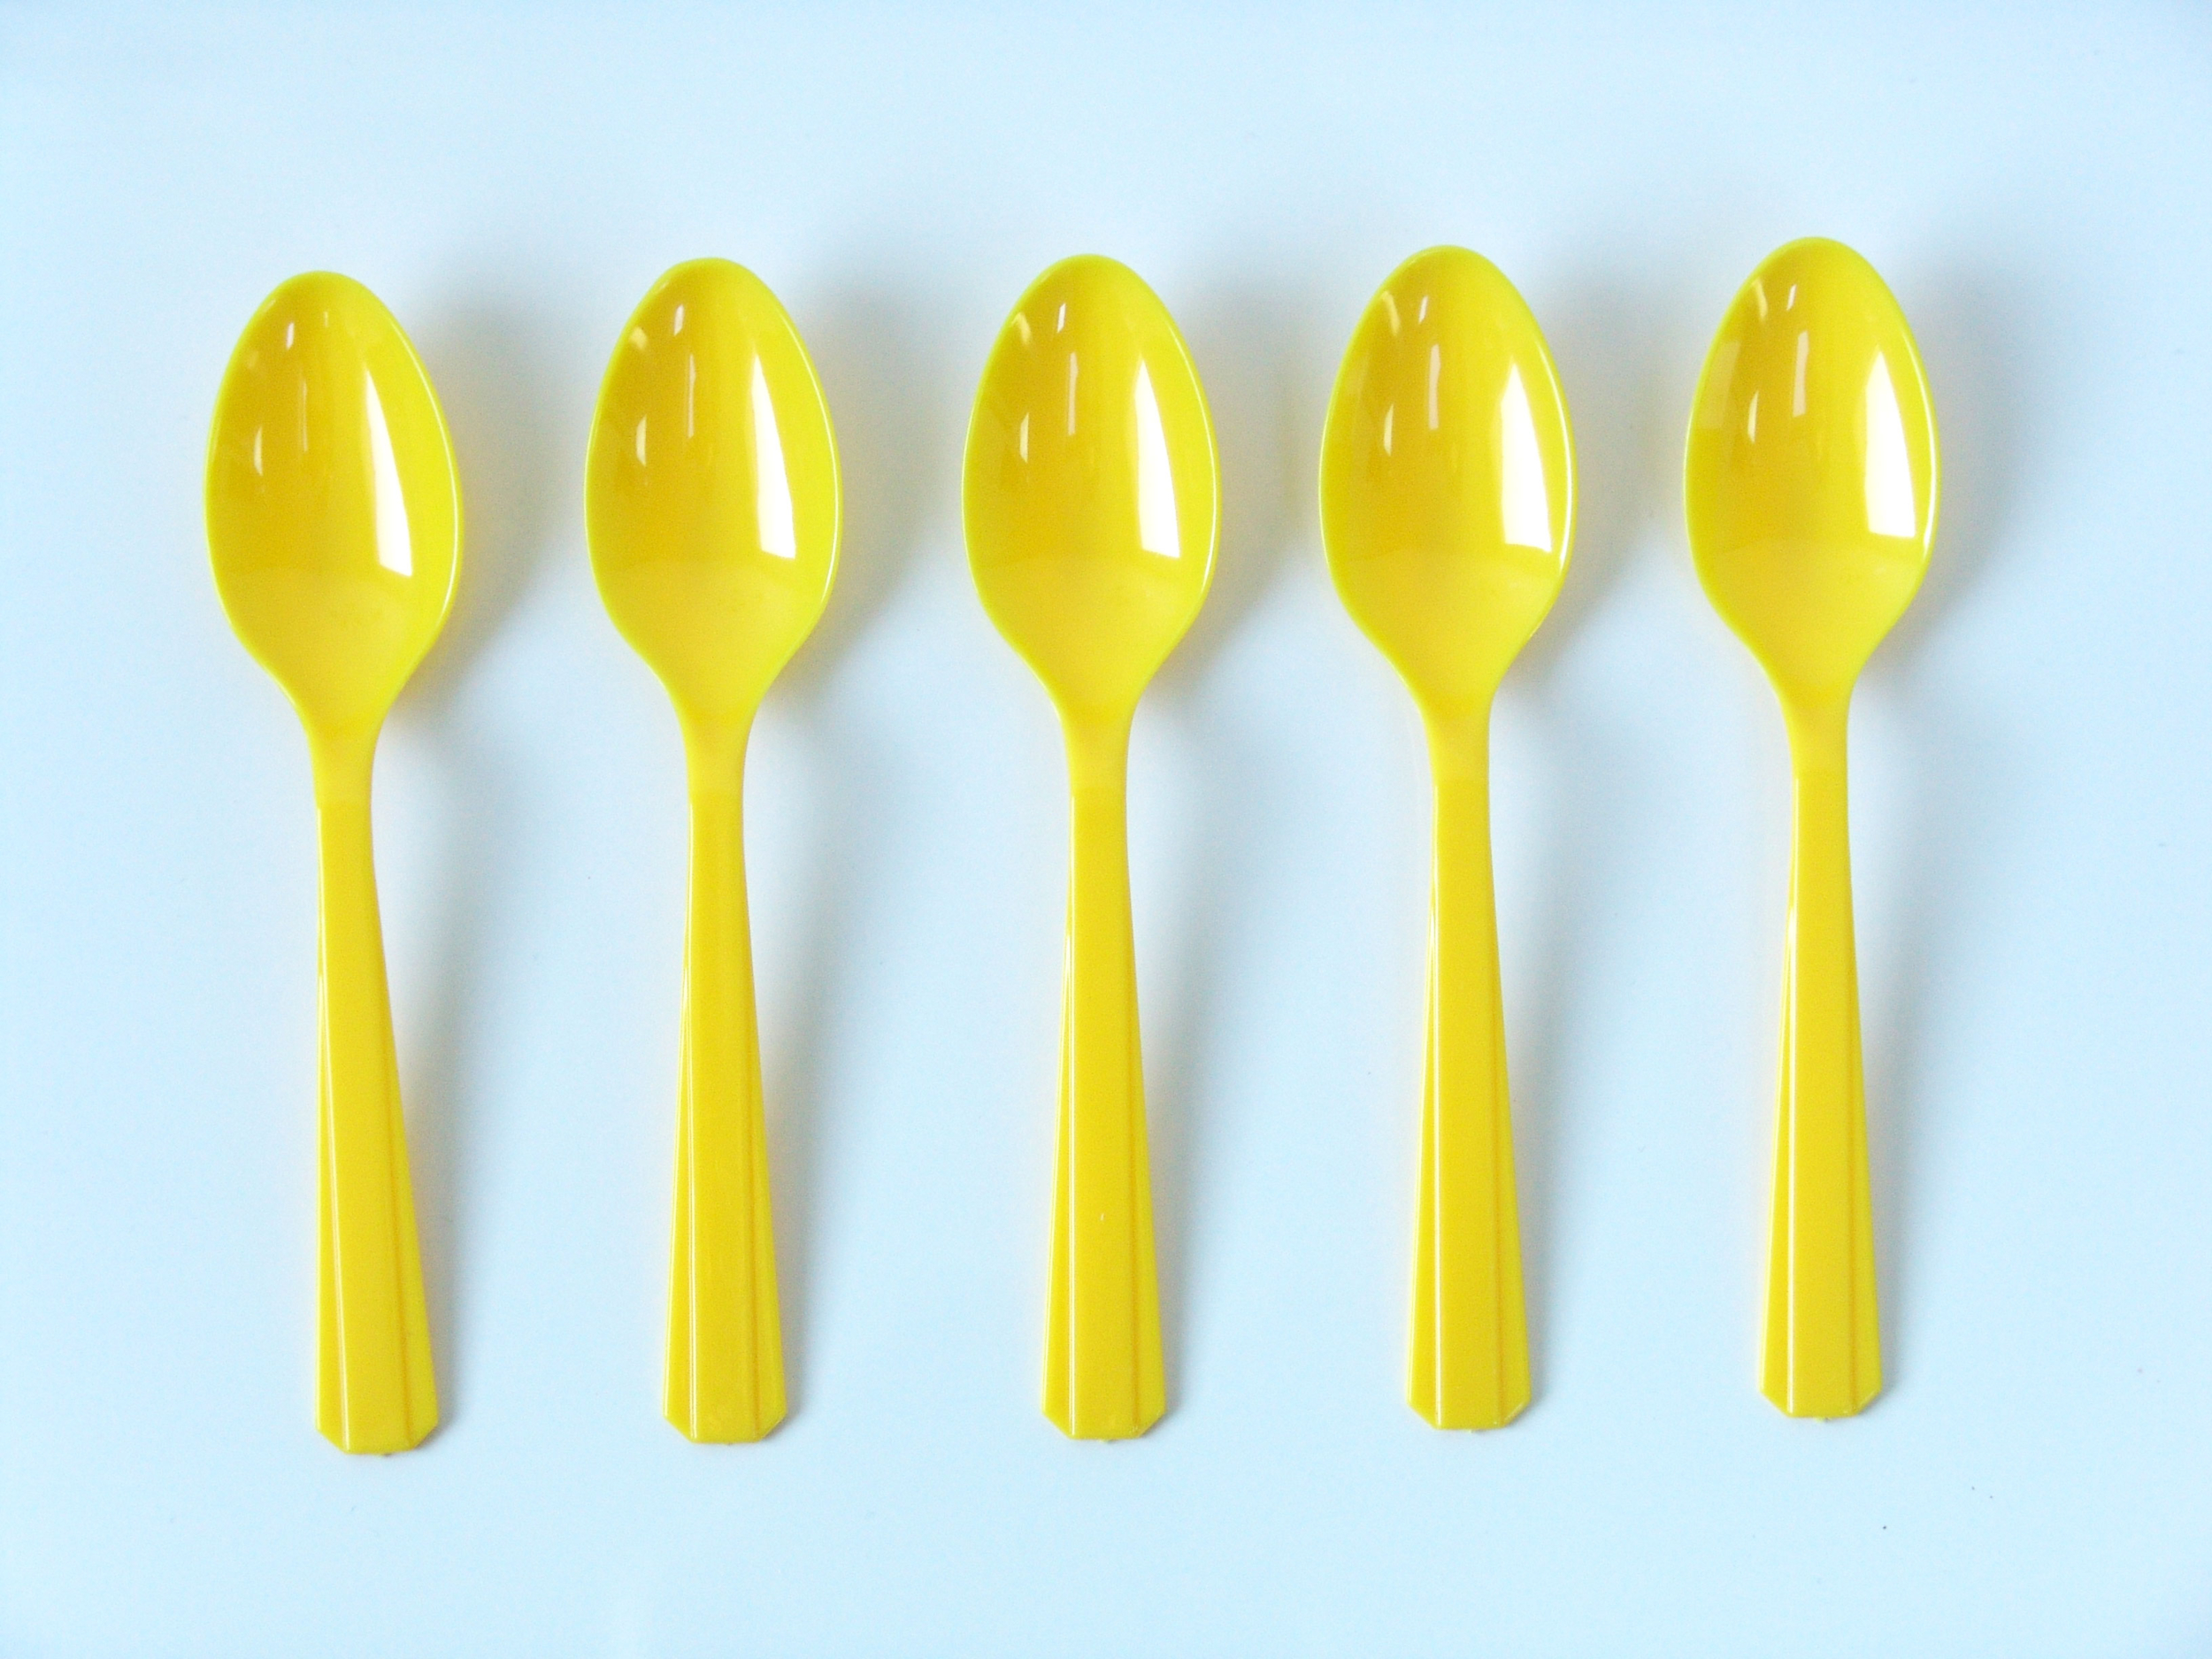 10 petites cuillères en plastique jaune